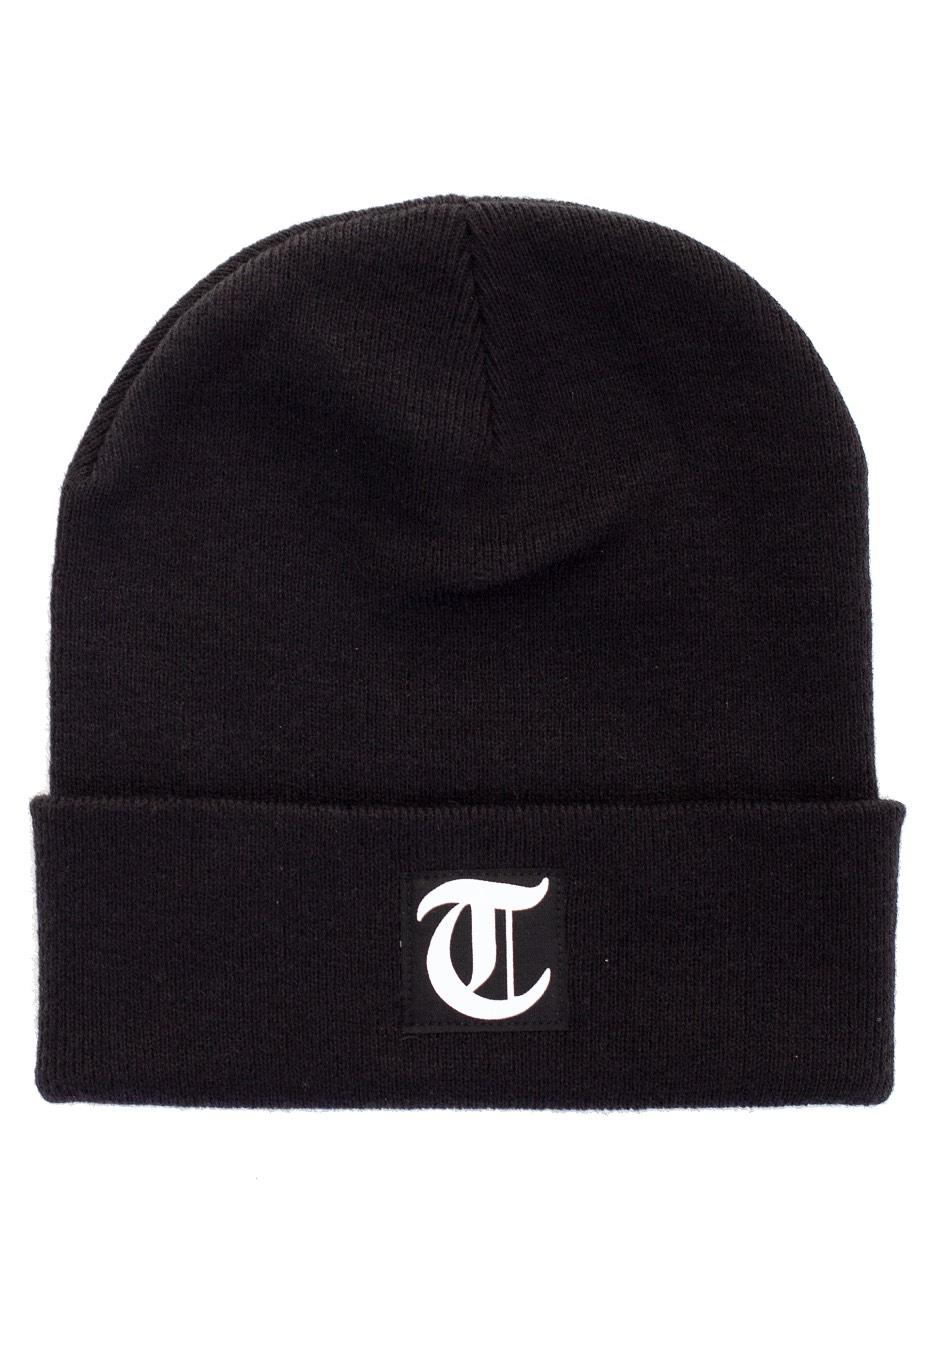 Terror - T Logo - Beanies